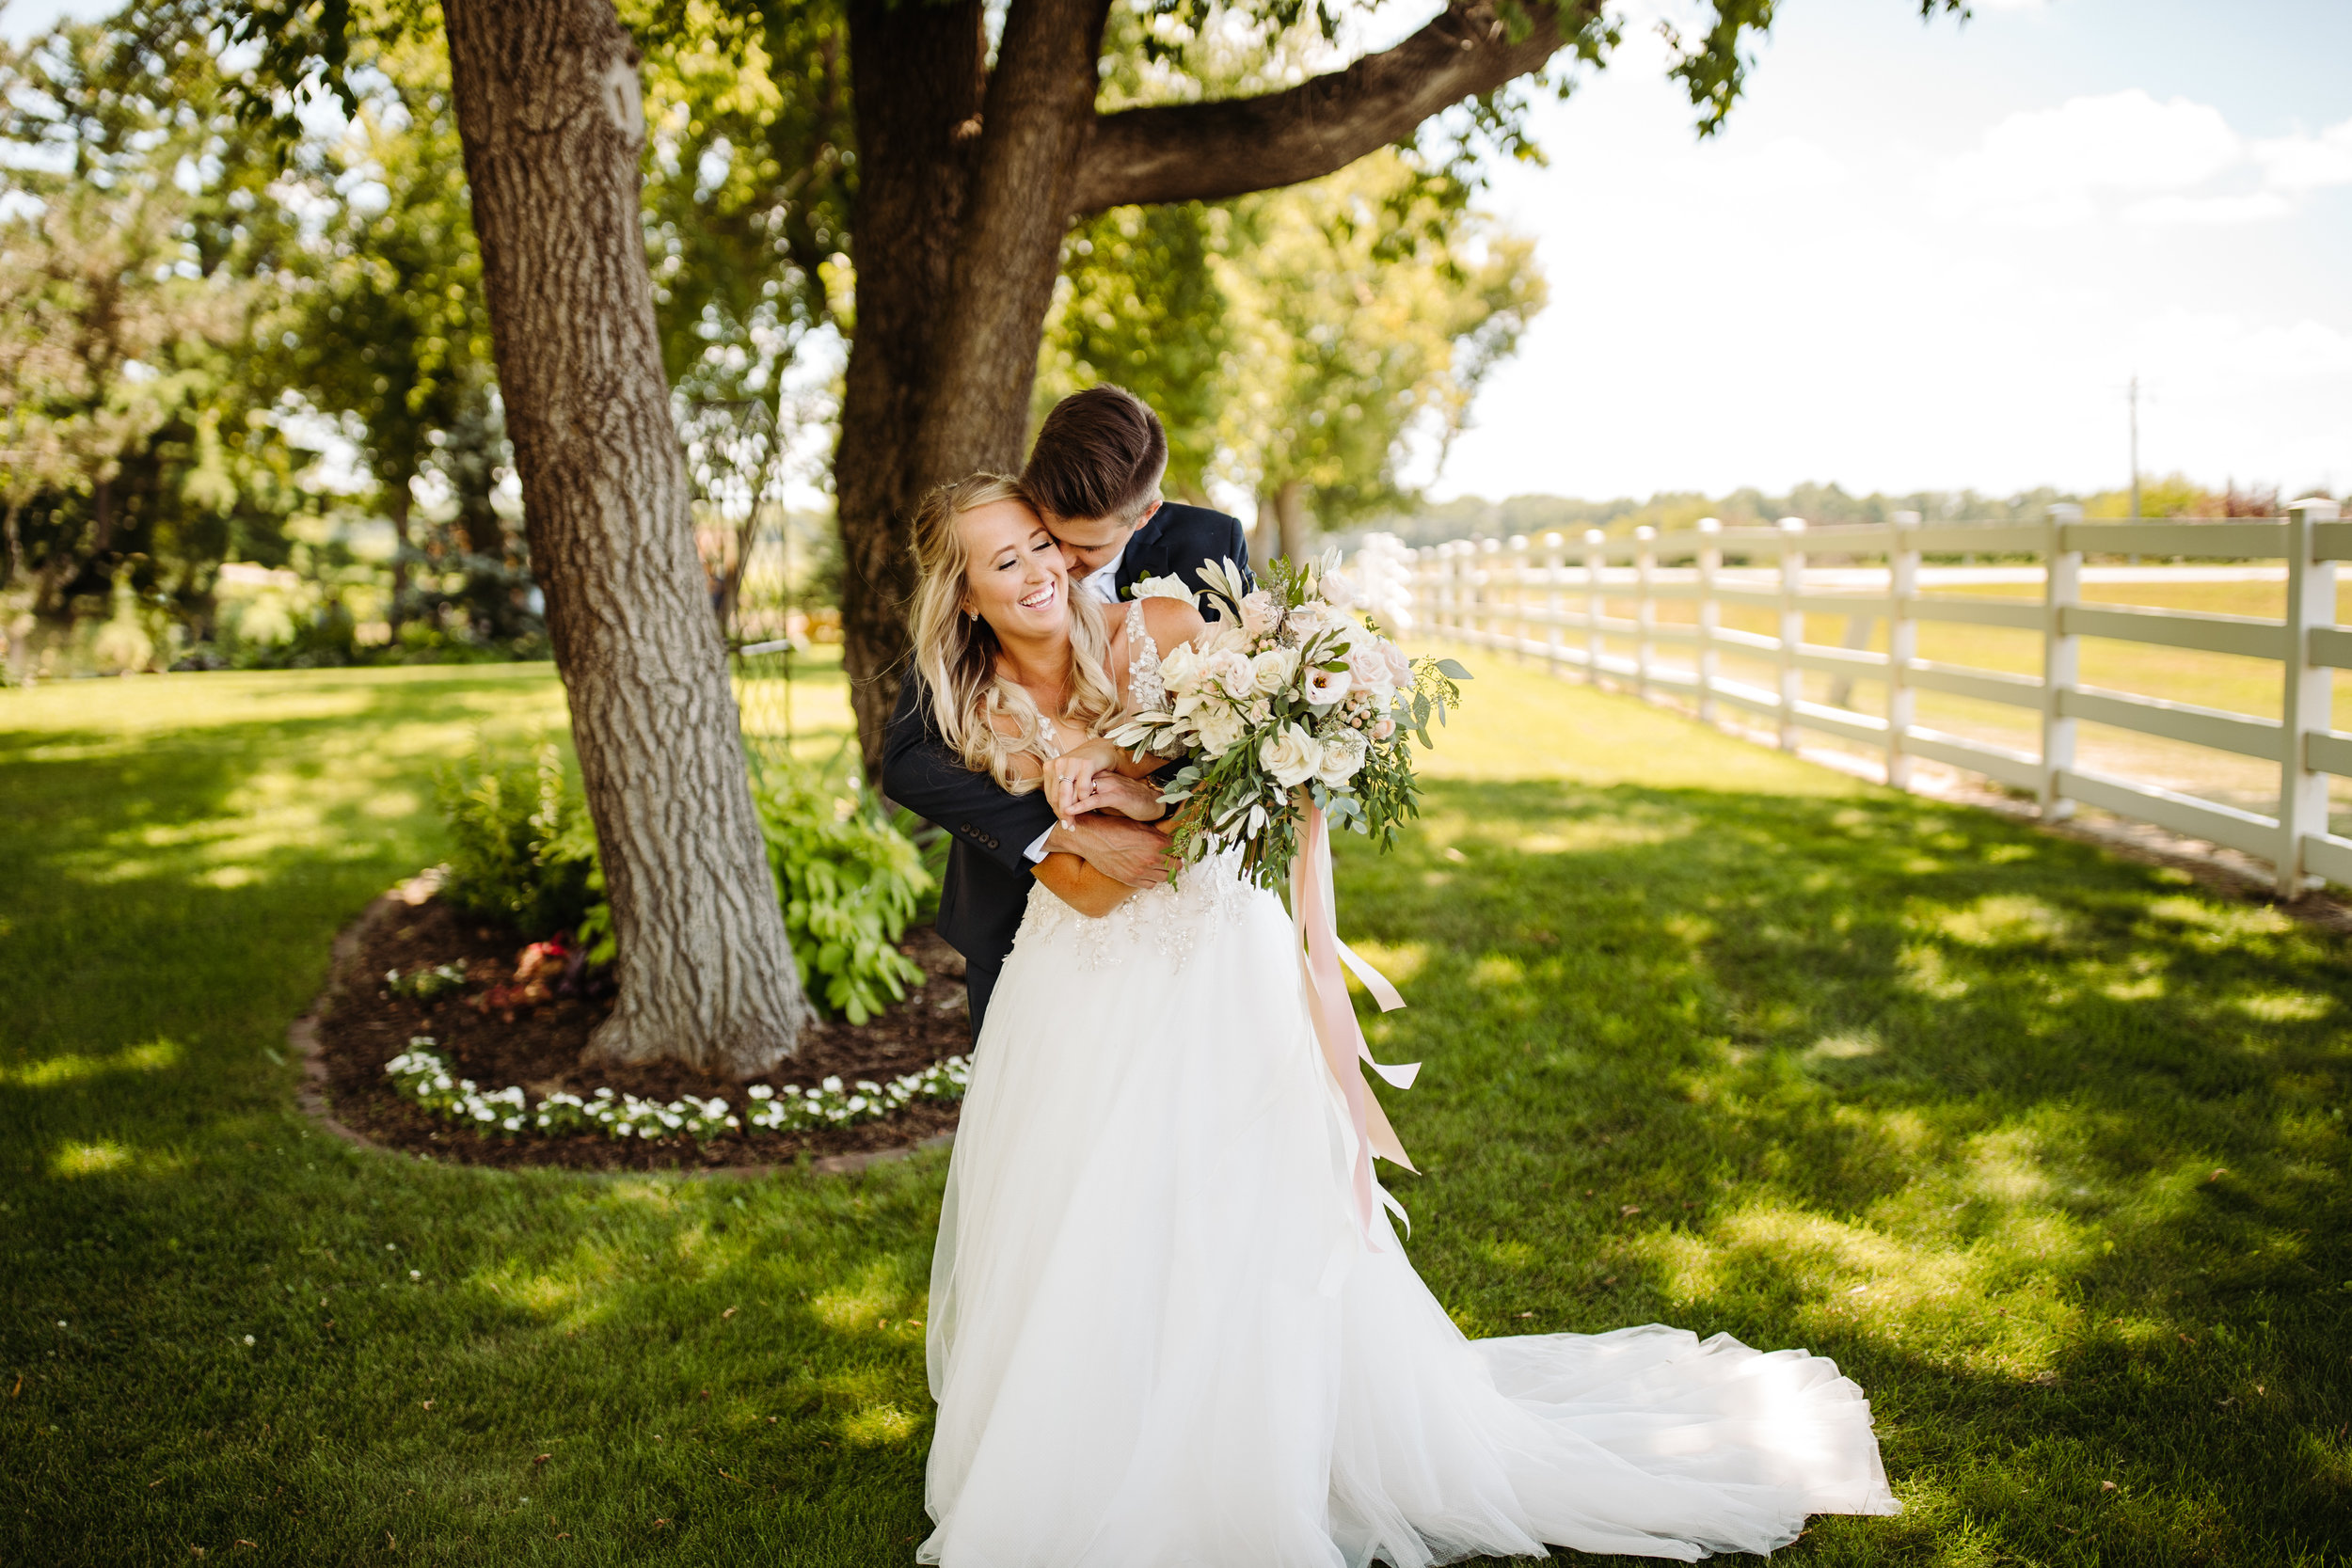 davies-wedding-03086.jpg